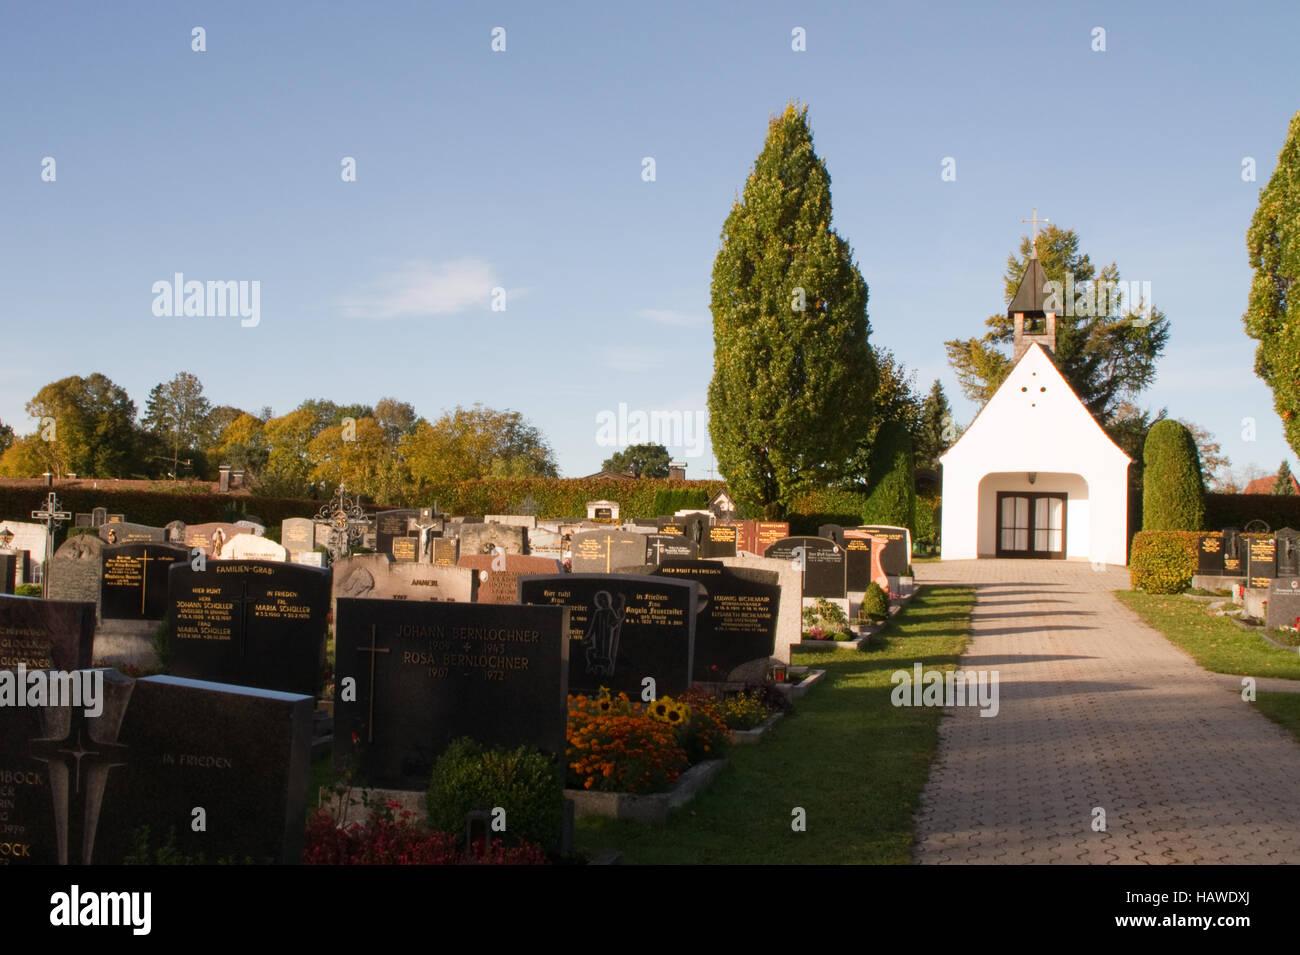 Cemetery, Bavaria, graves commemorate, pray - Stock Image